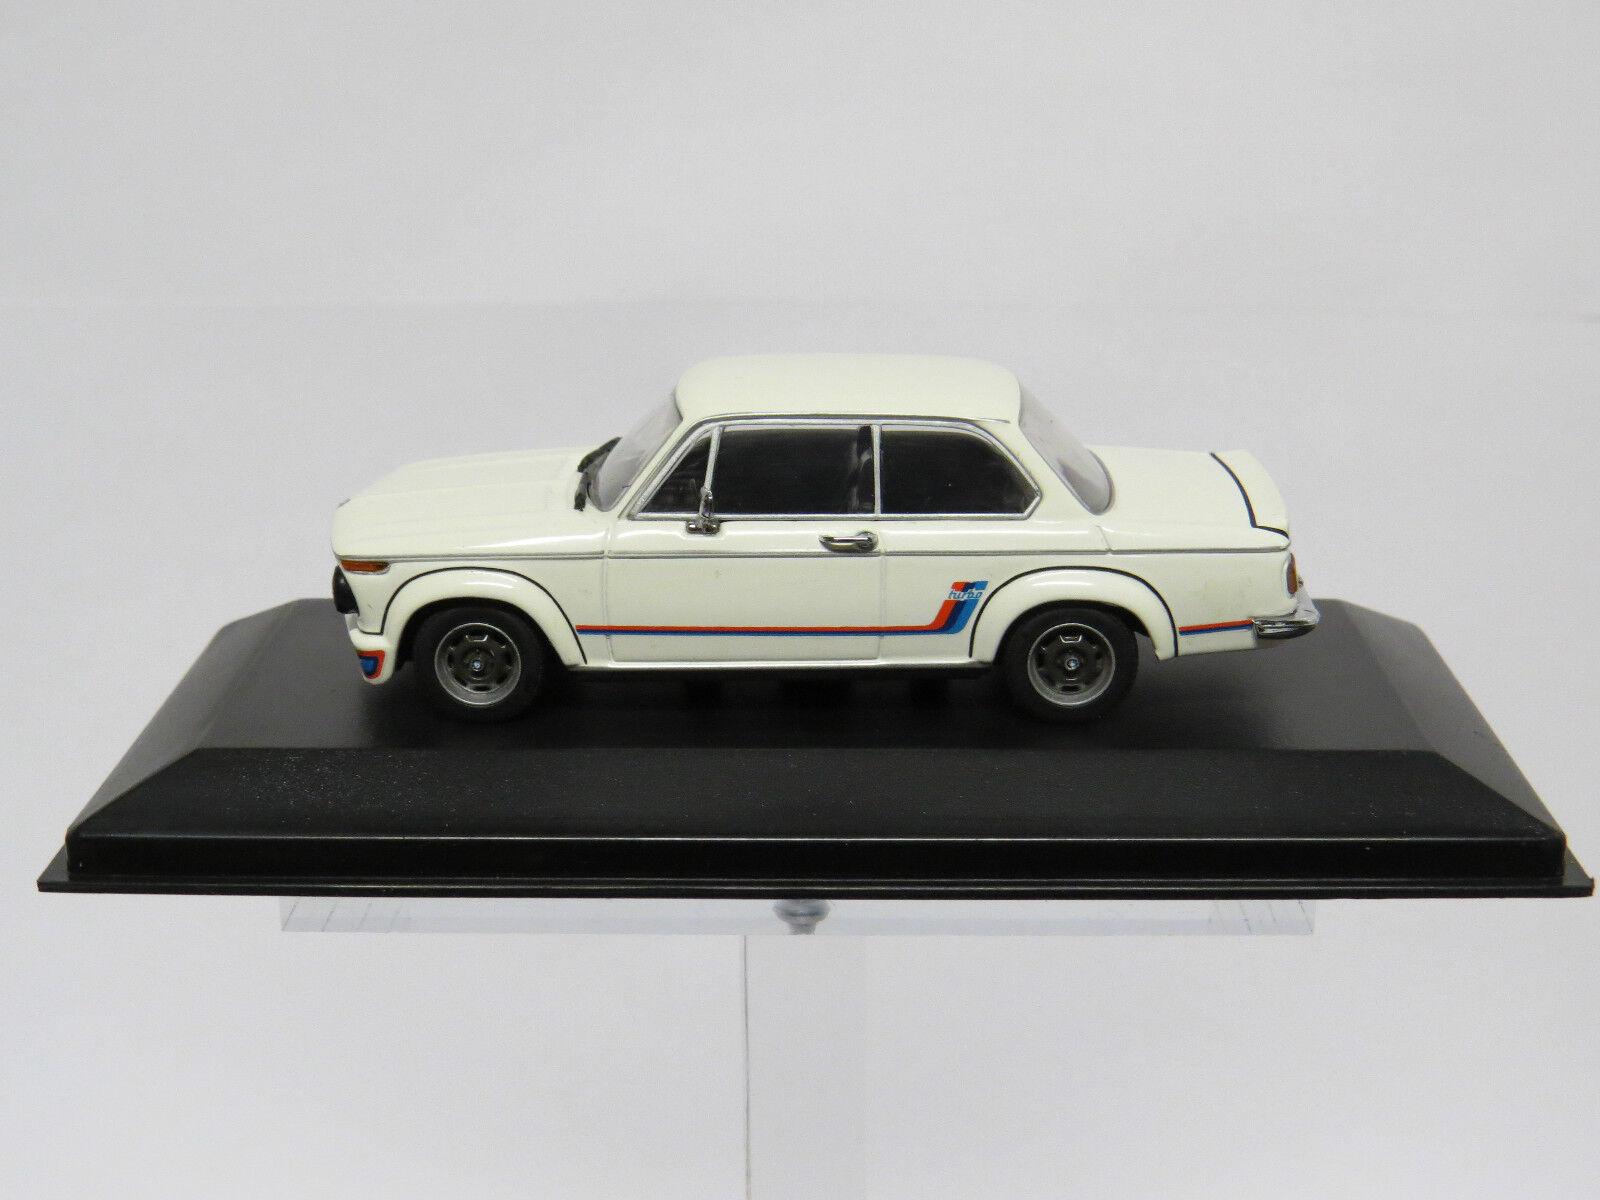 BMW 2002 Turbo 1973-1974 Cream 1 43 Minichamps Nr. 430022200